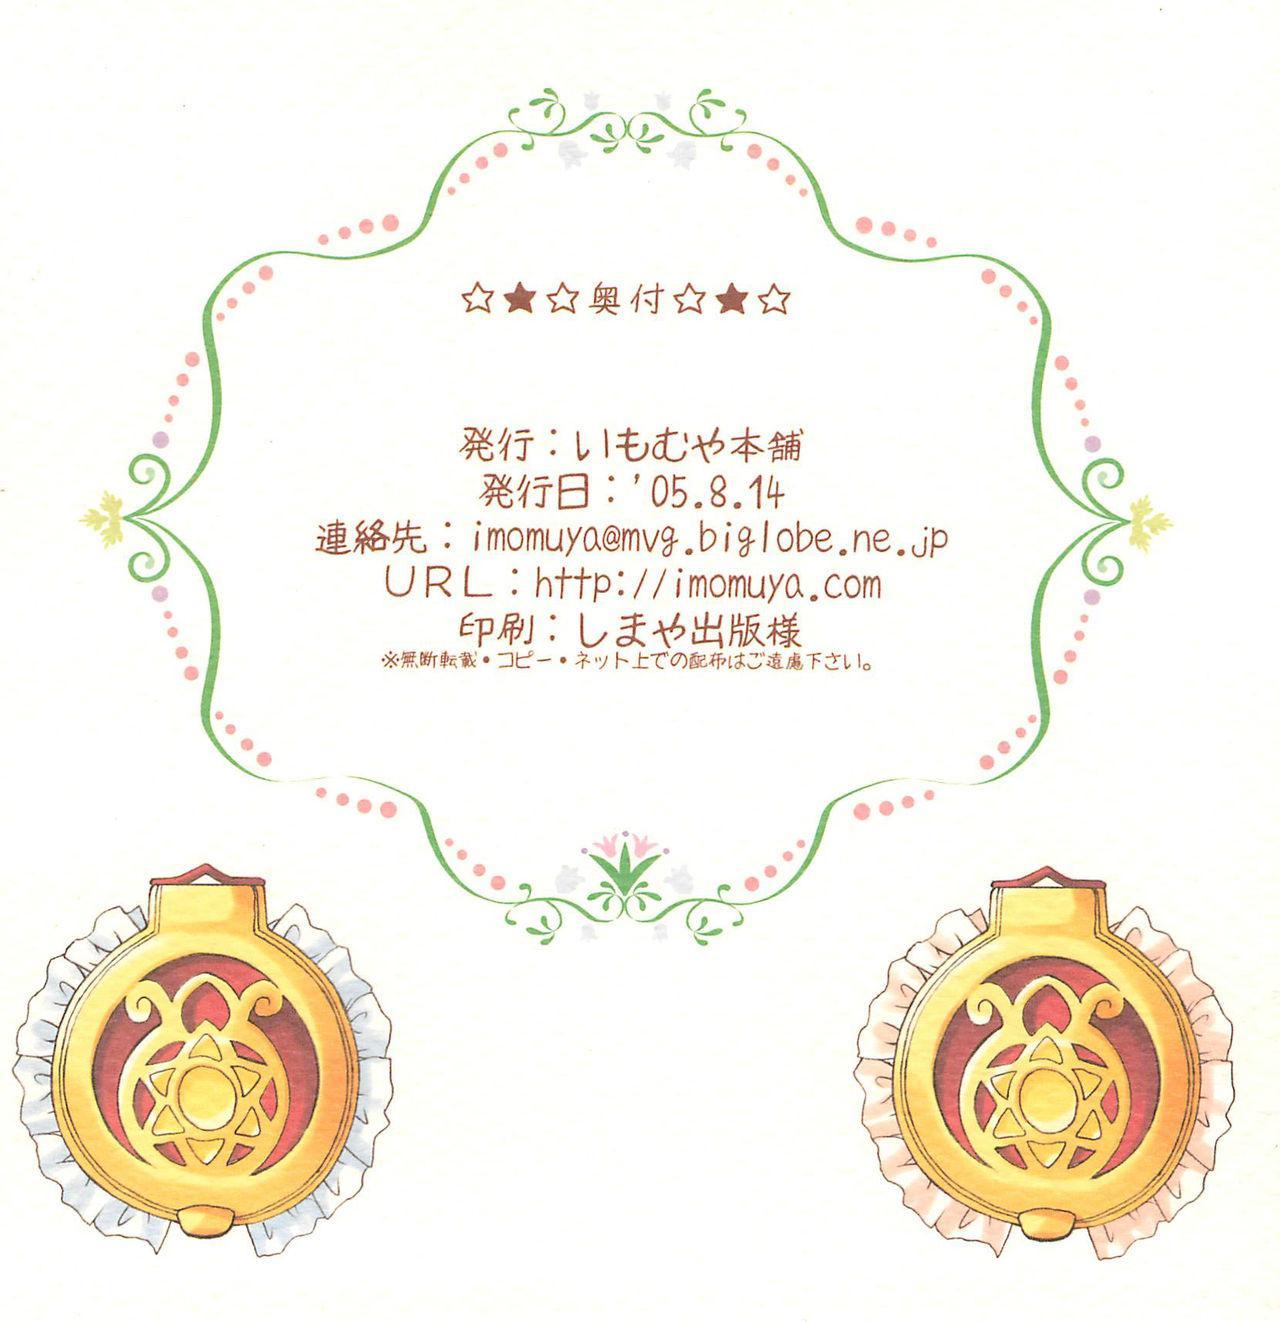 Onsen to Sannin no Ohime-sama 11